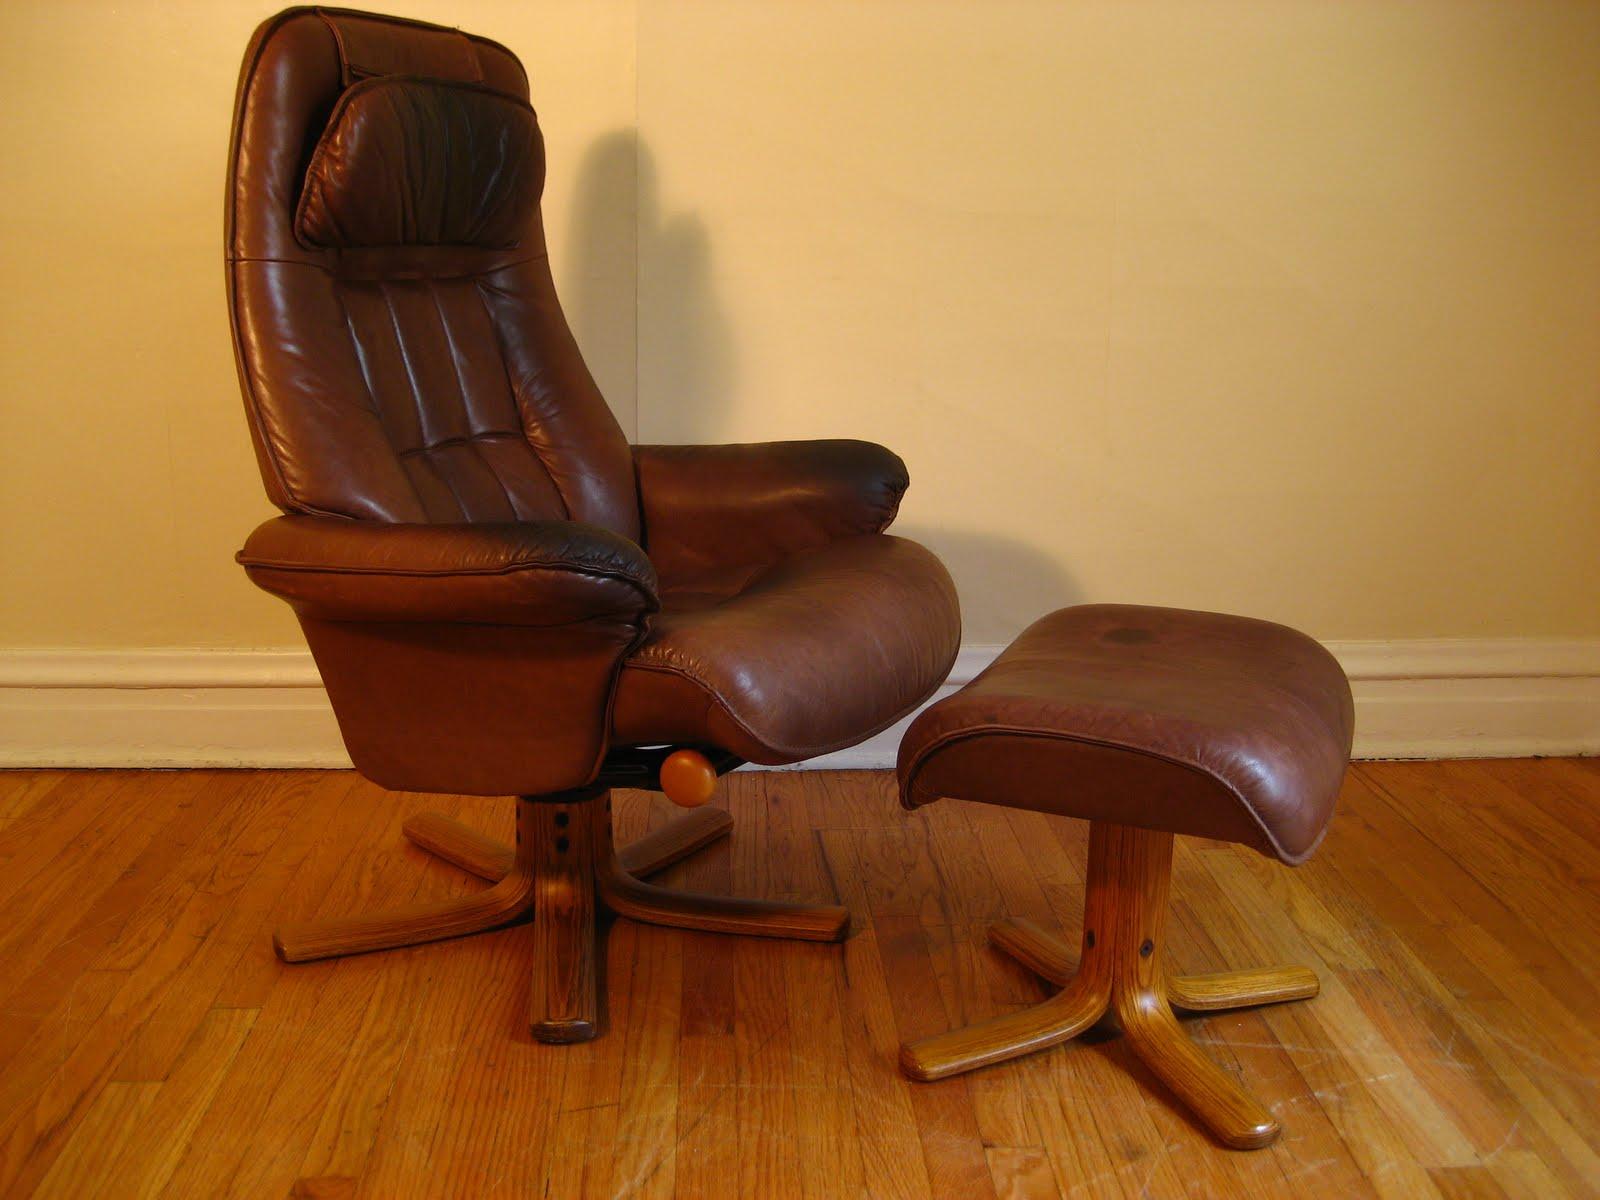 flatout design: Norwegian Lounge Chair